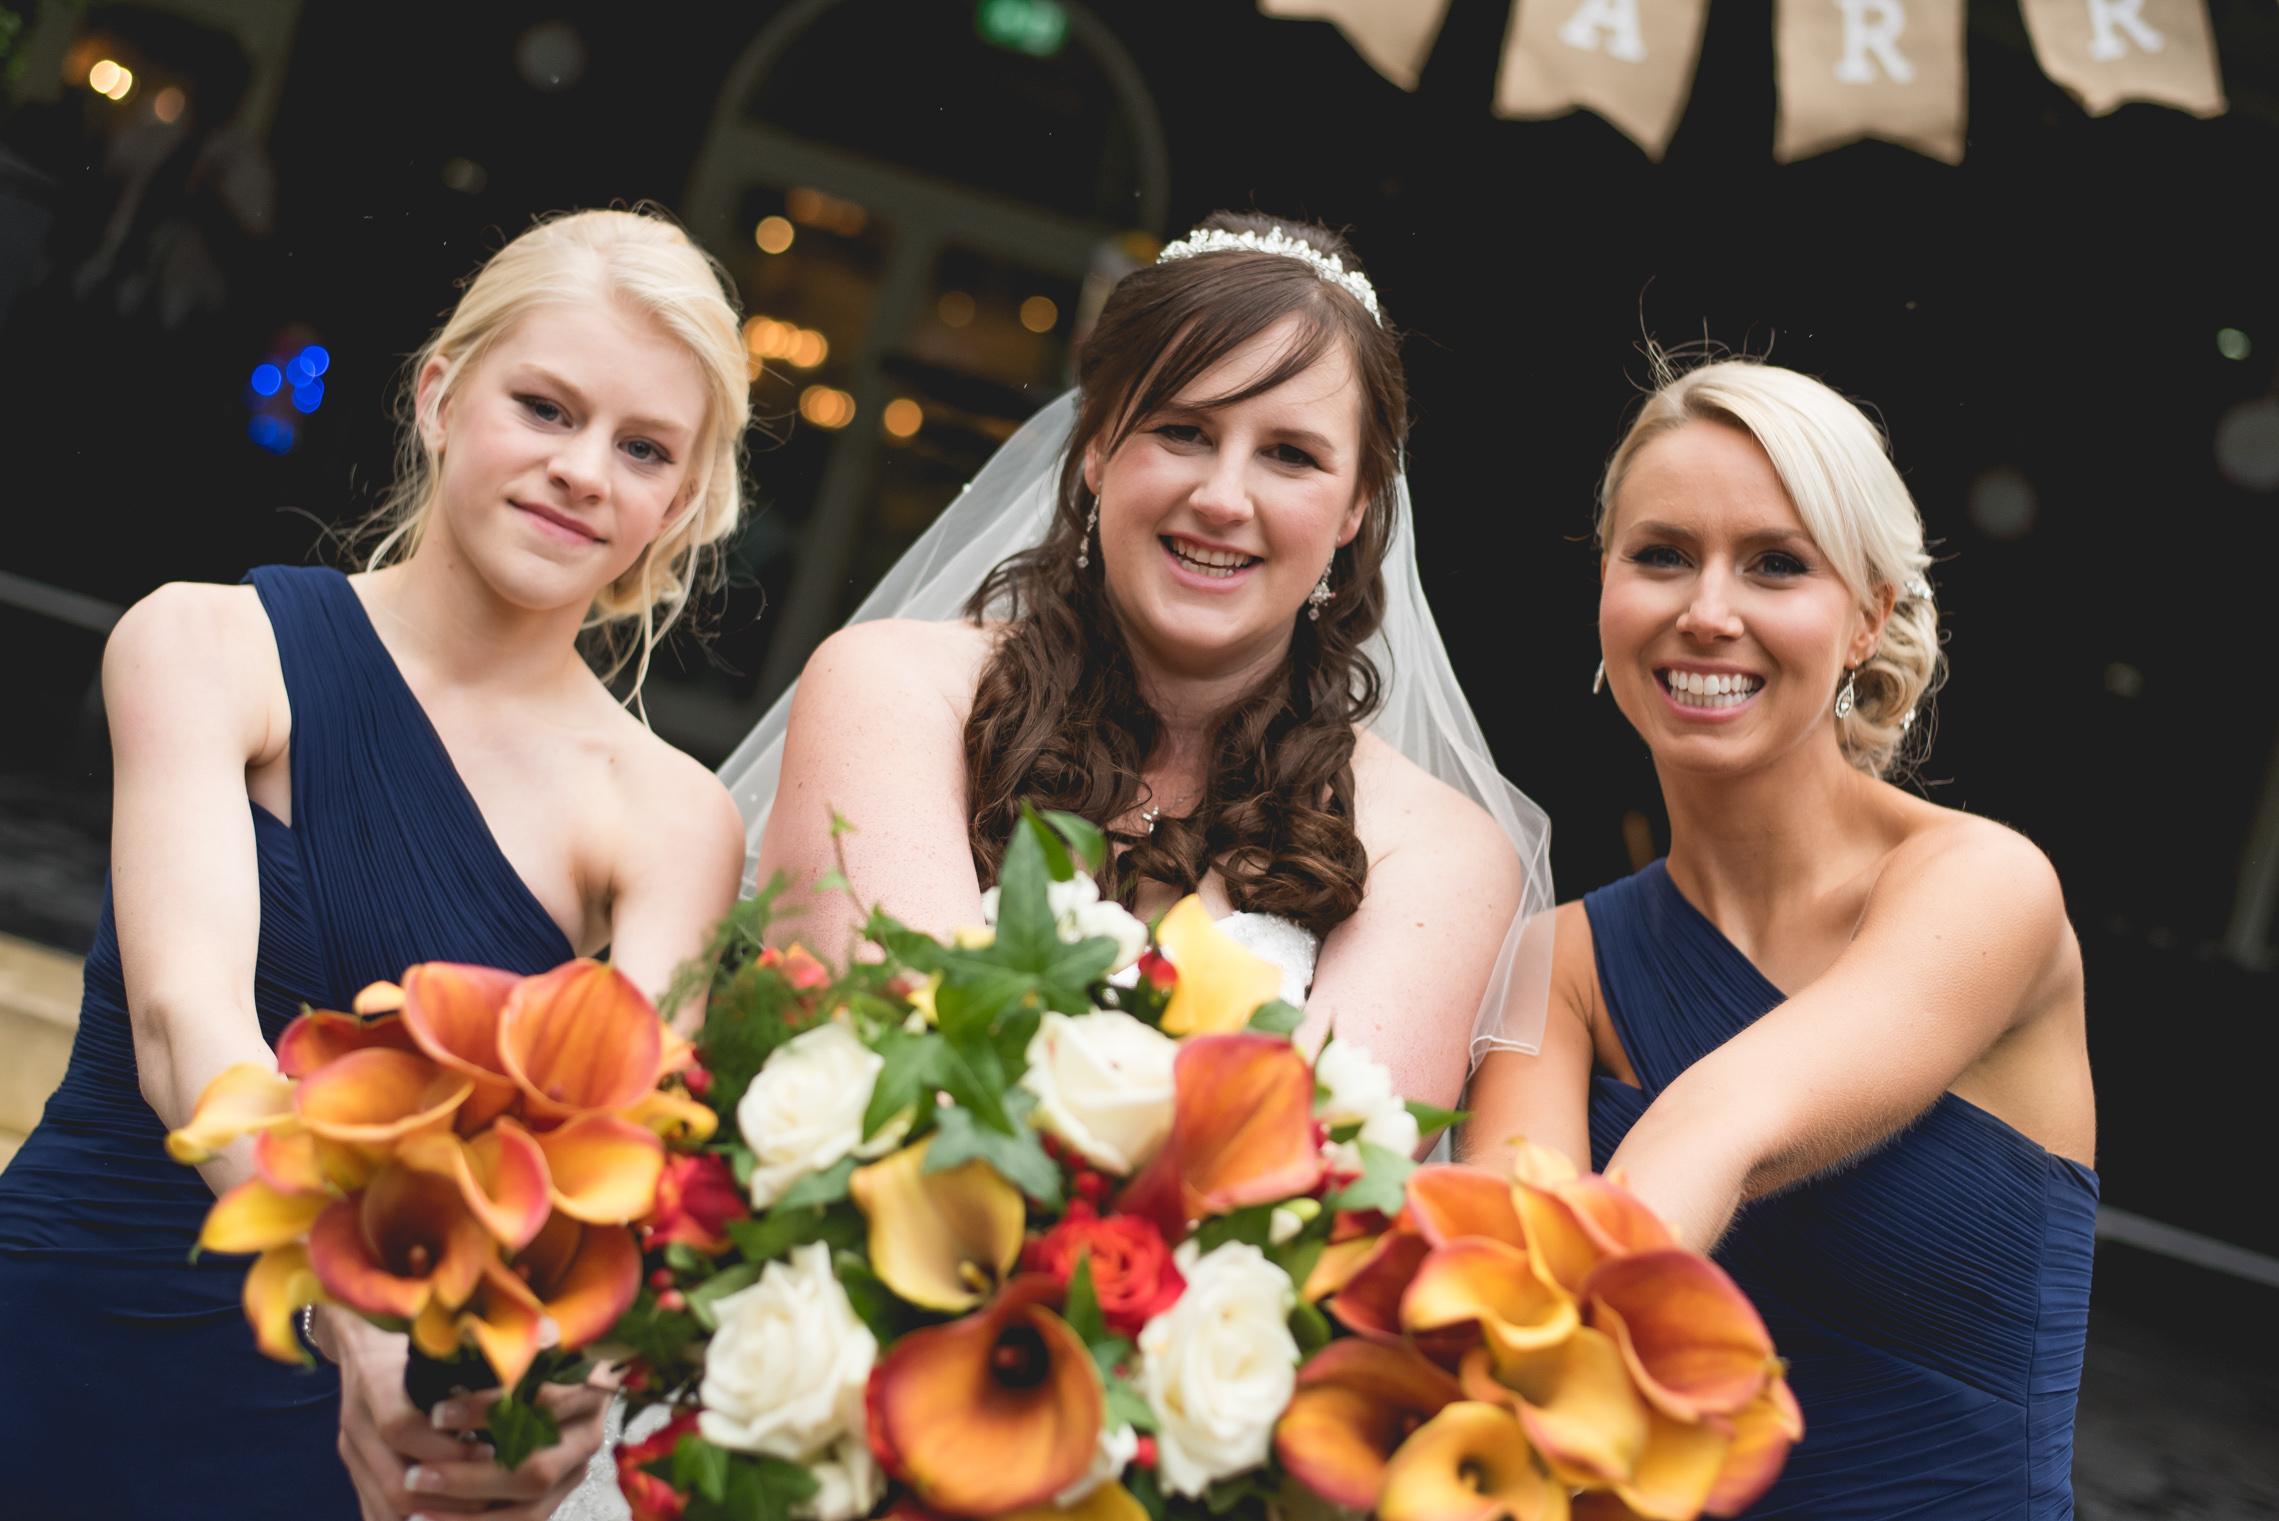 The+Fairlawns+wedding+Aldridge+StLukes+Church-160.jpg